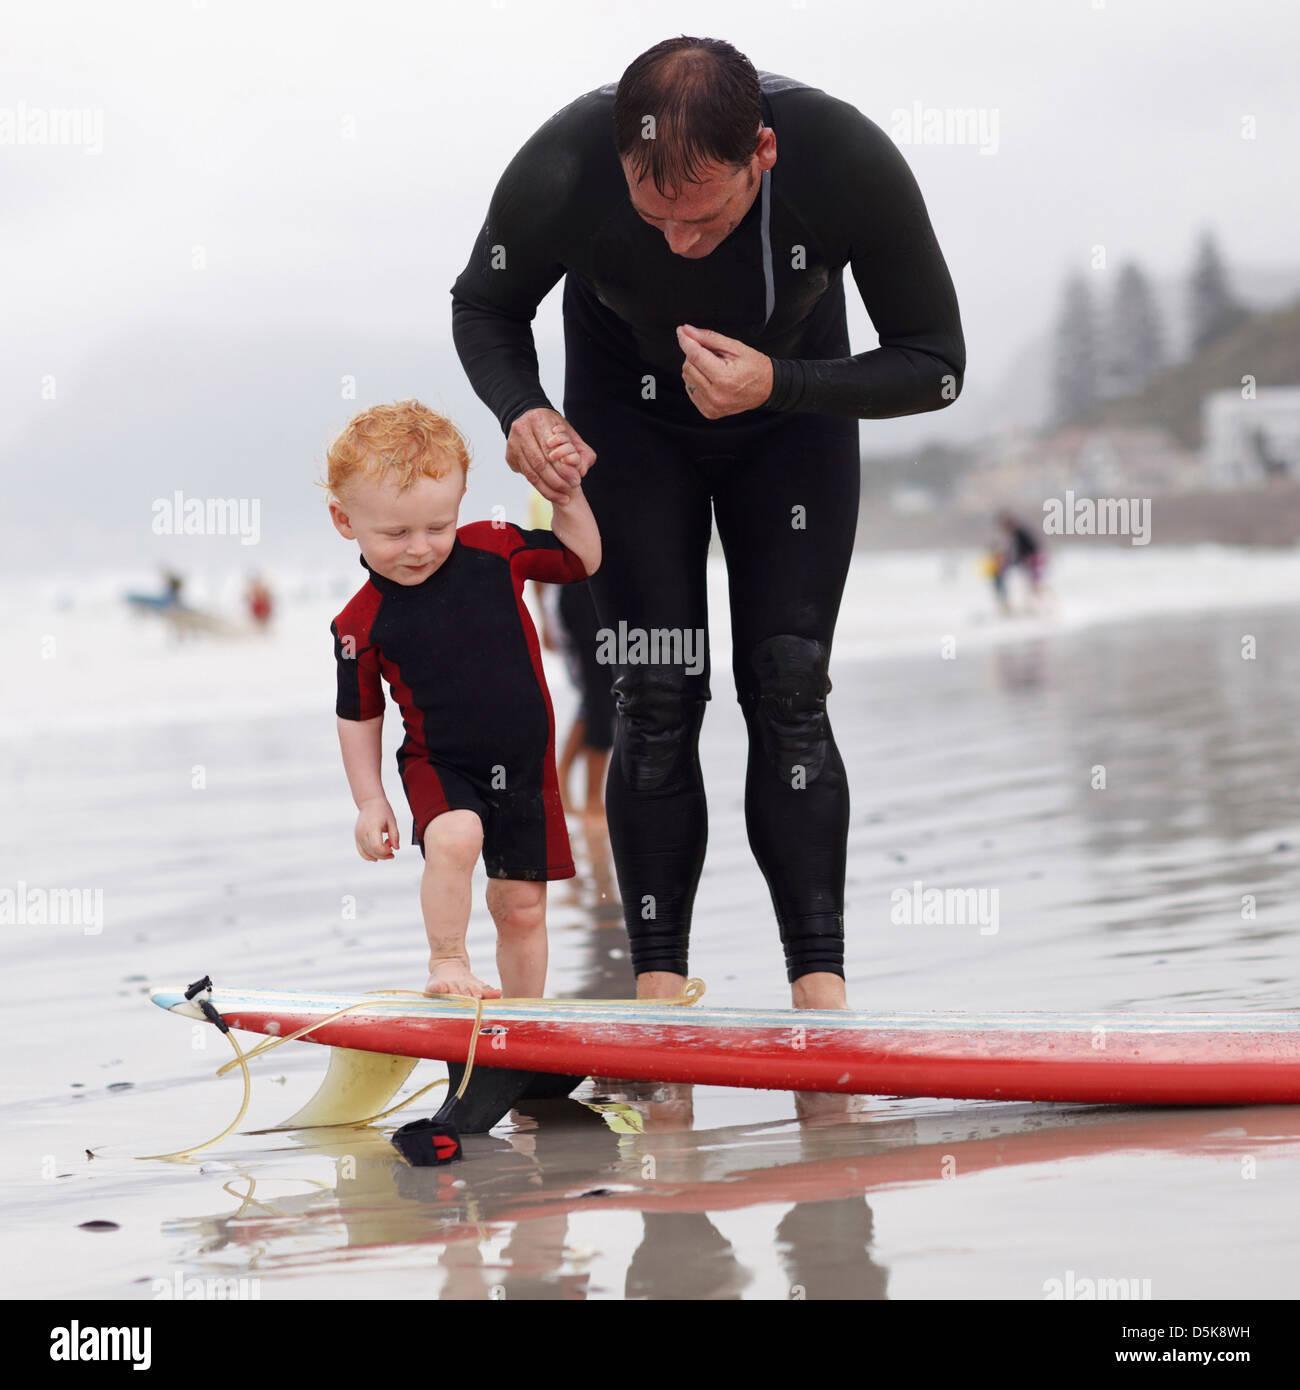 Vater und Sohn (2-3) am Strand von Surfbrett Stockbild